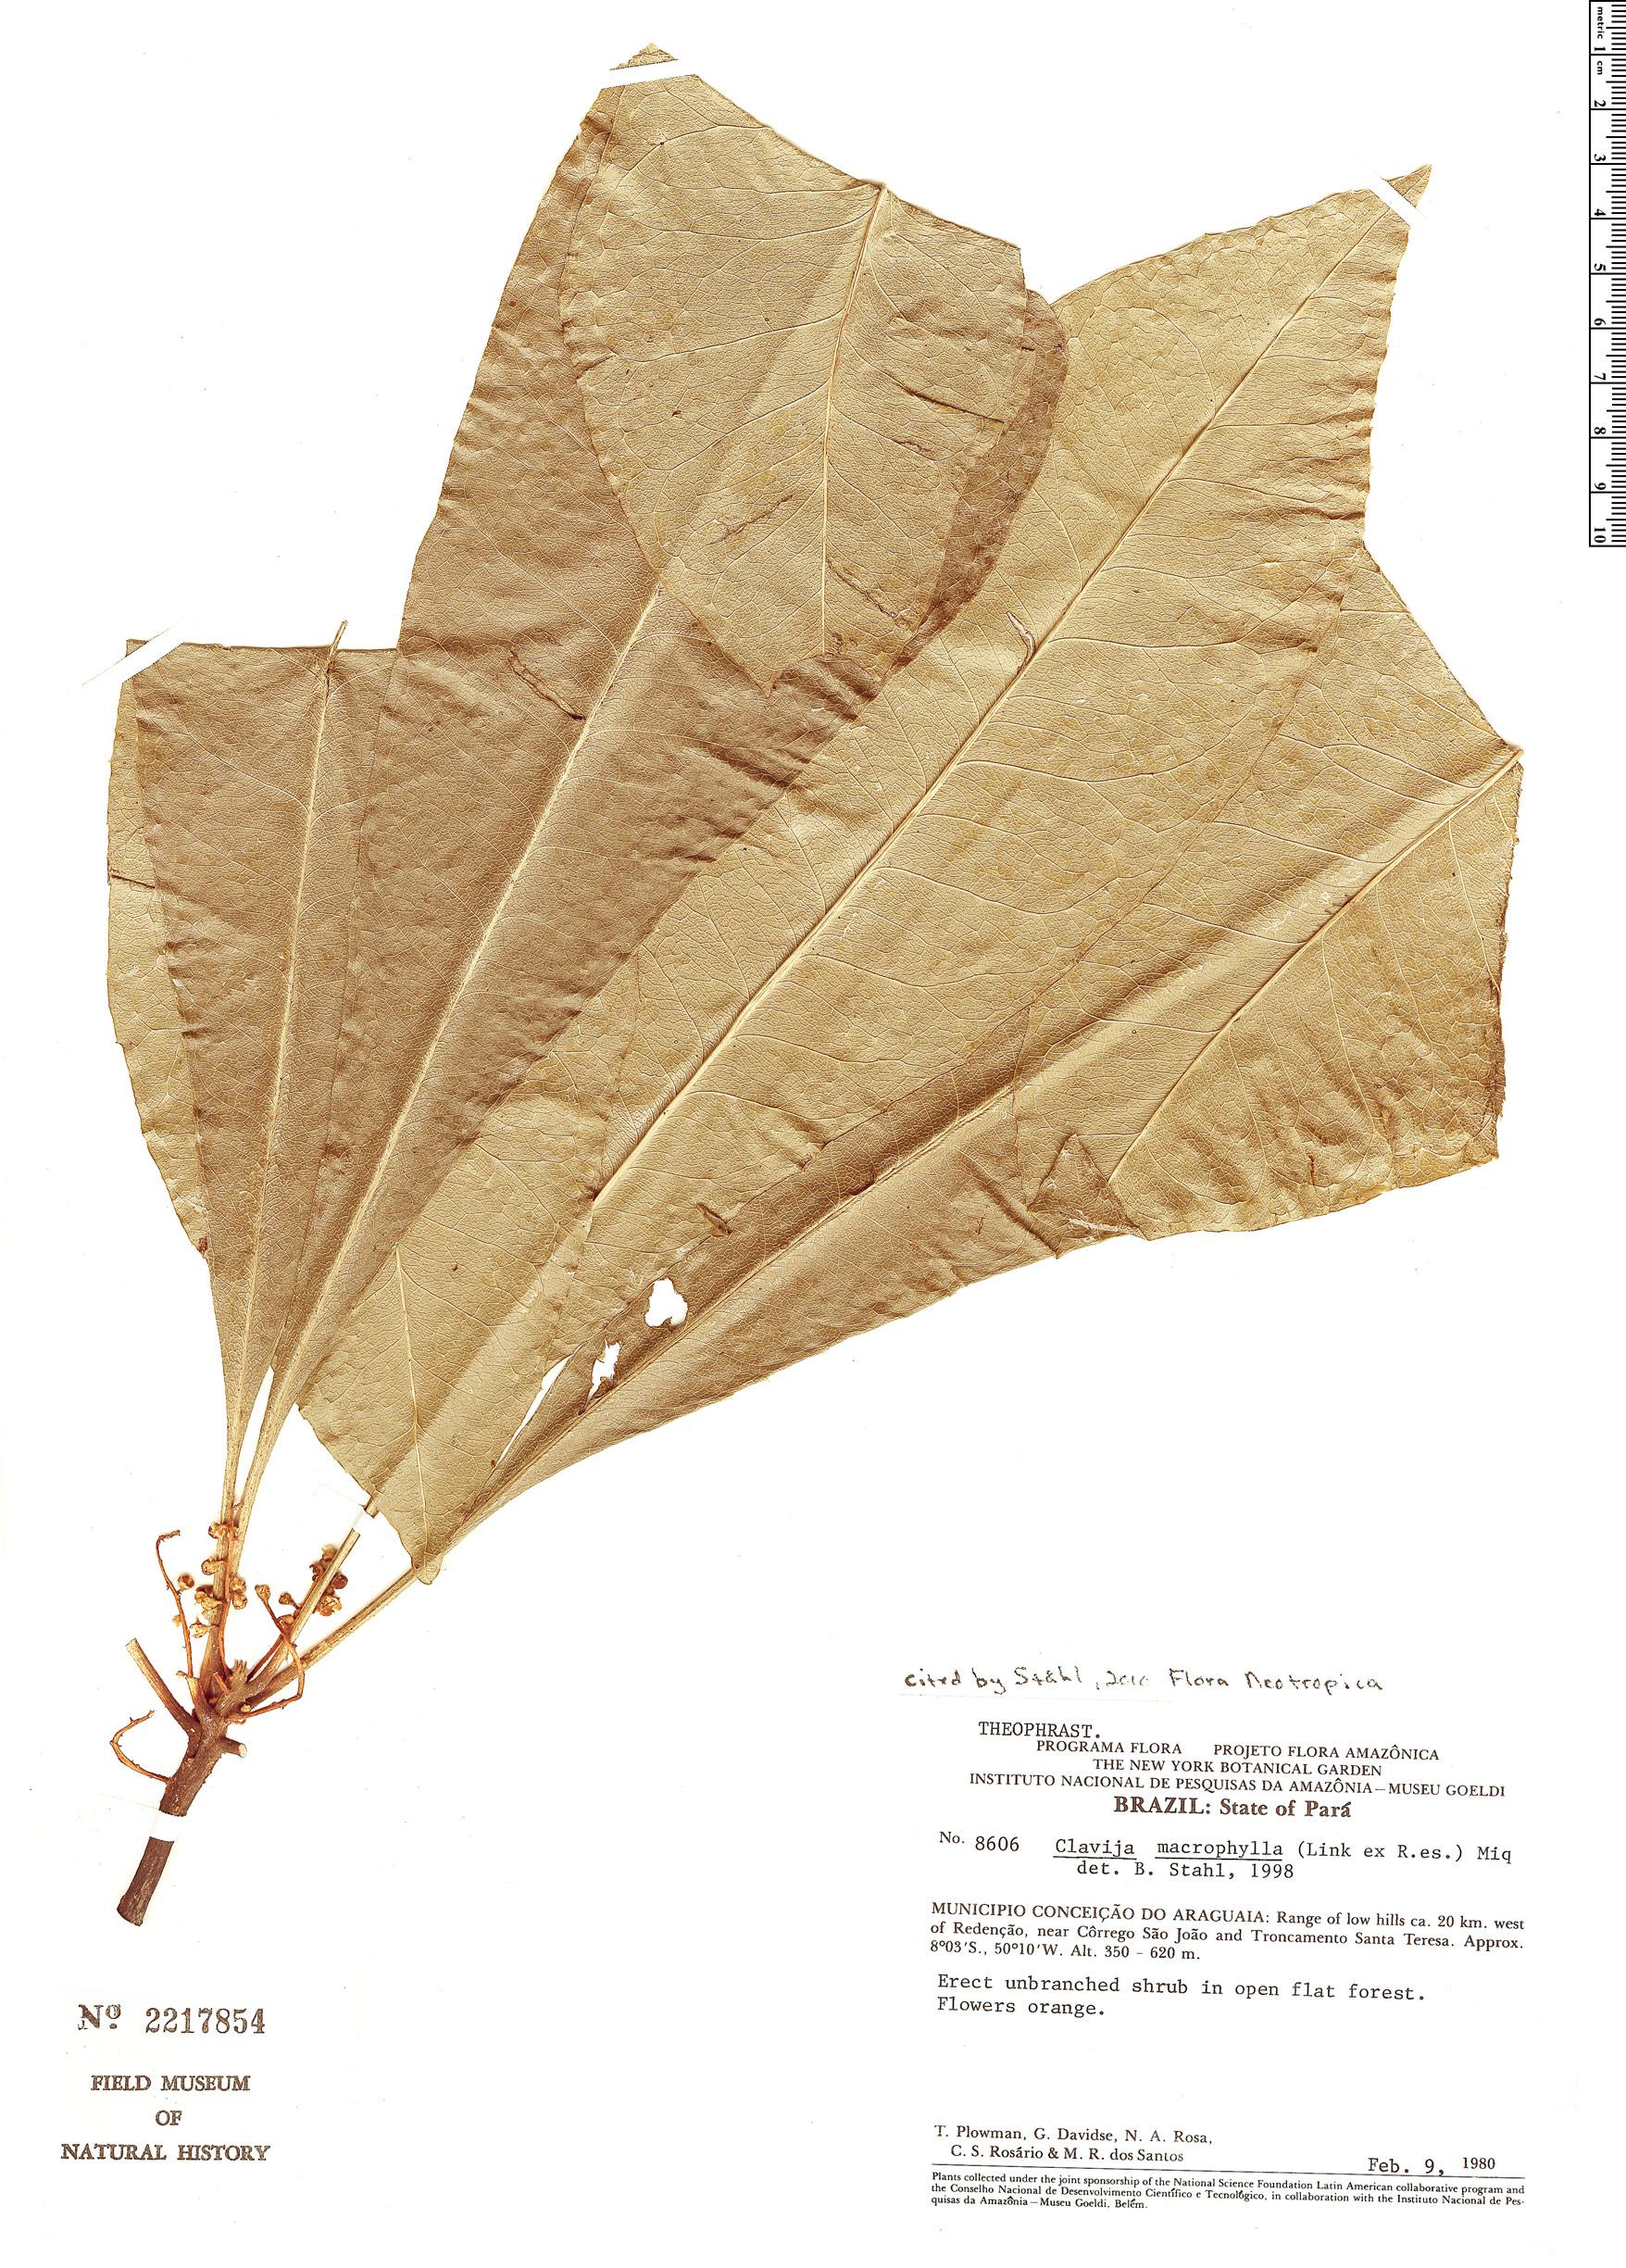 Specimen: Clavija macrophylla